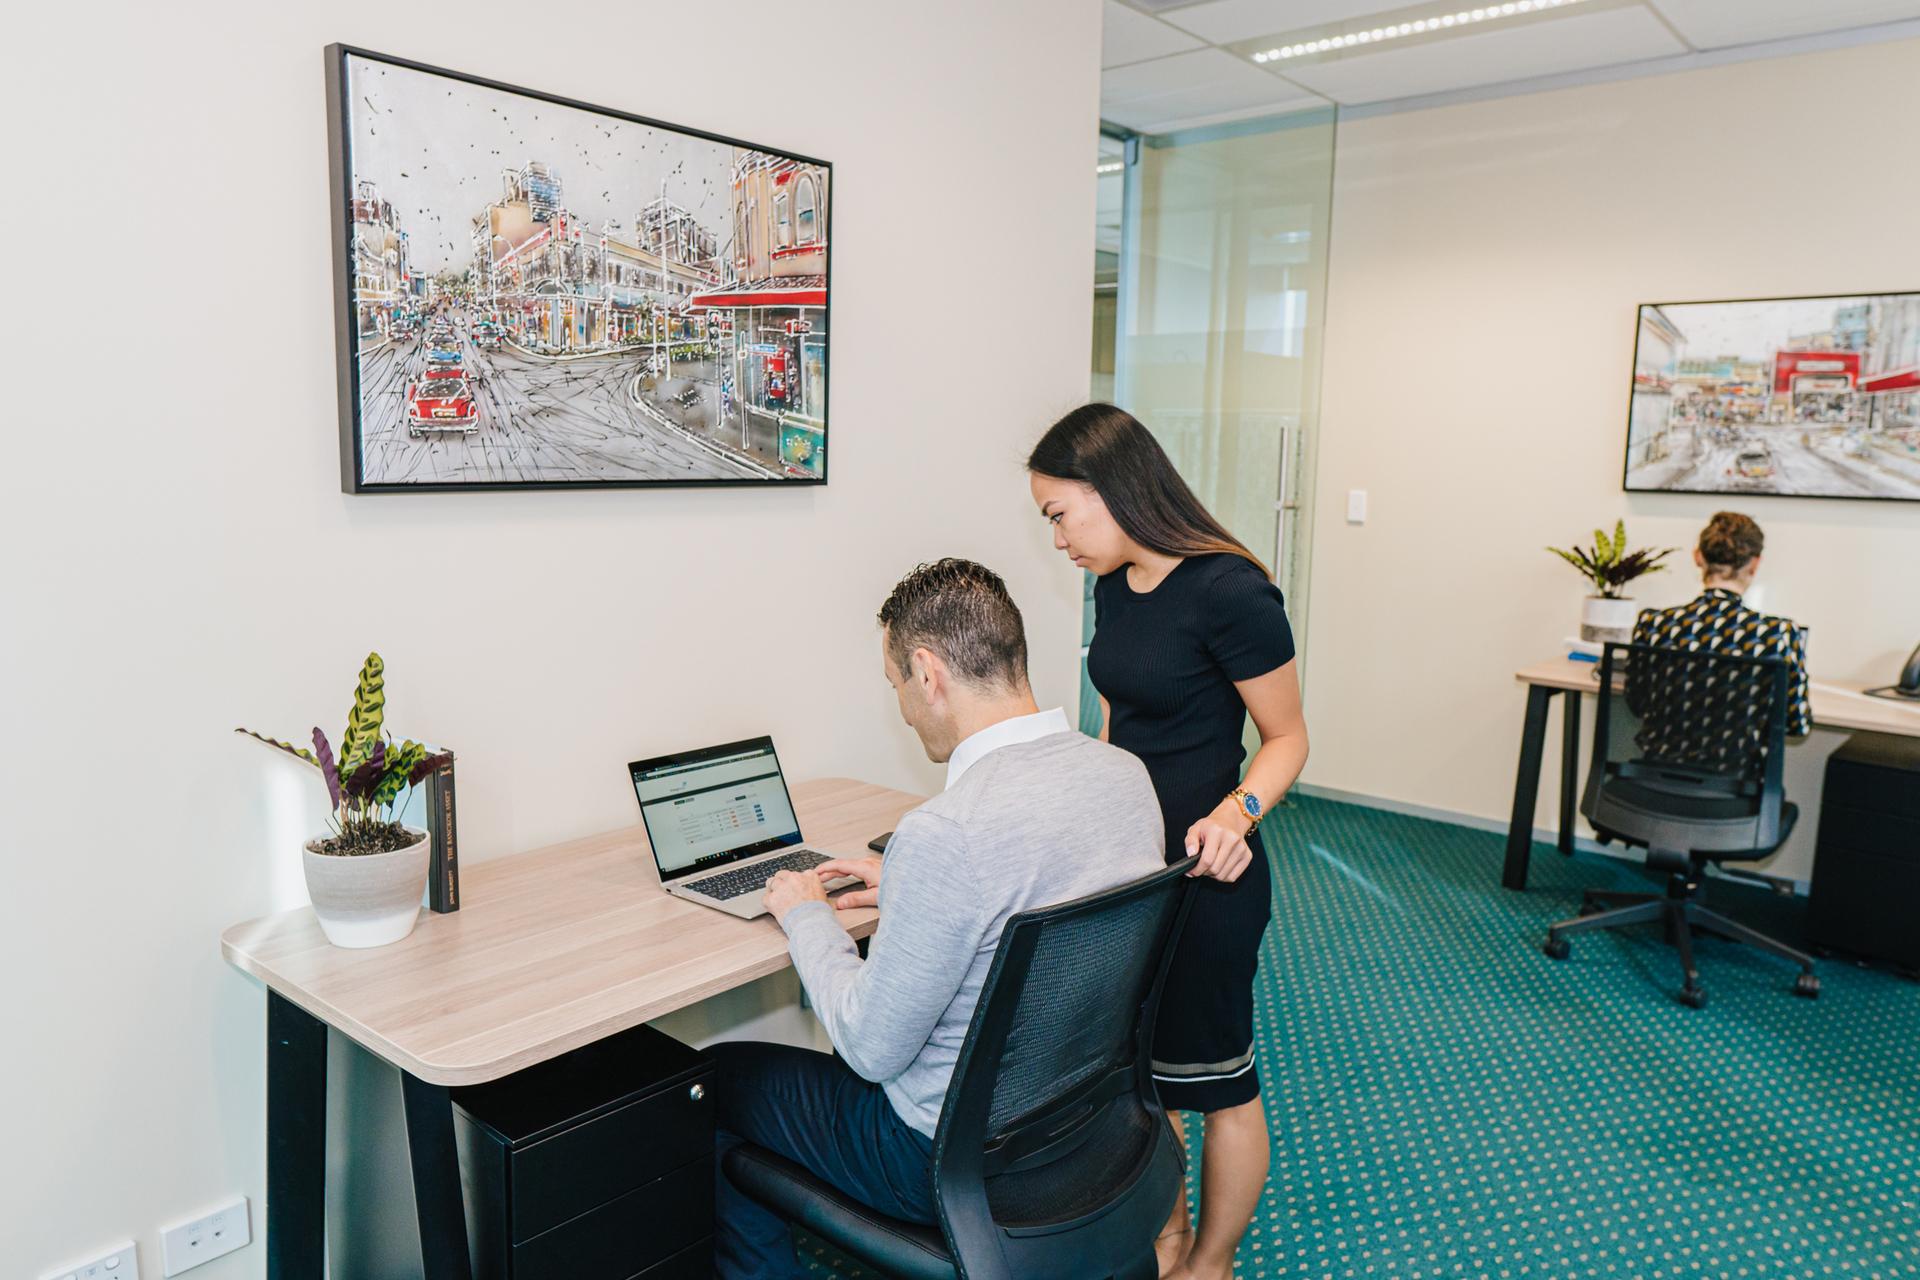 Collaborative 6-person workspace with views over the Parramatta CBD